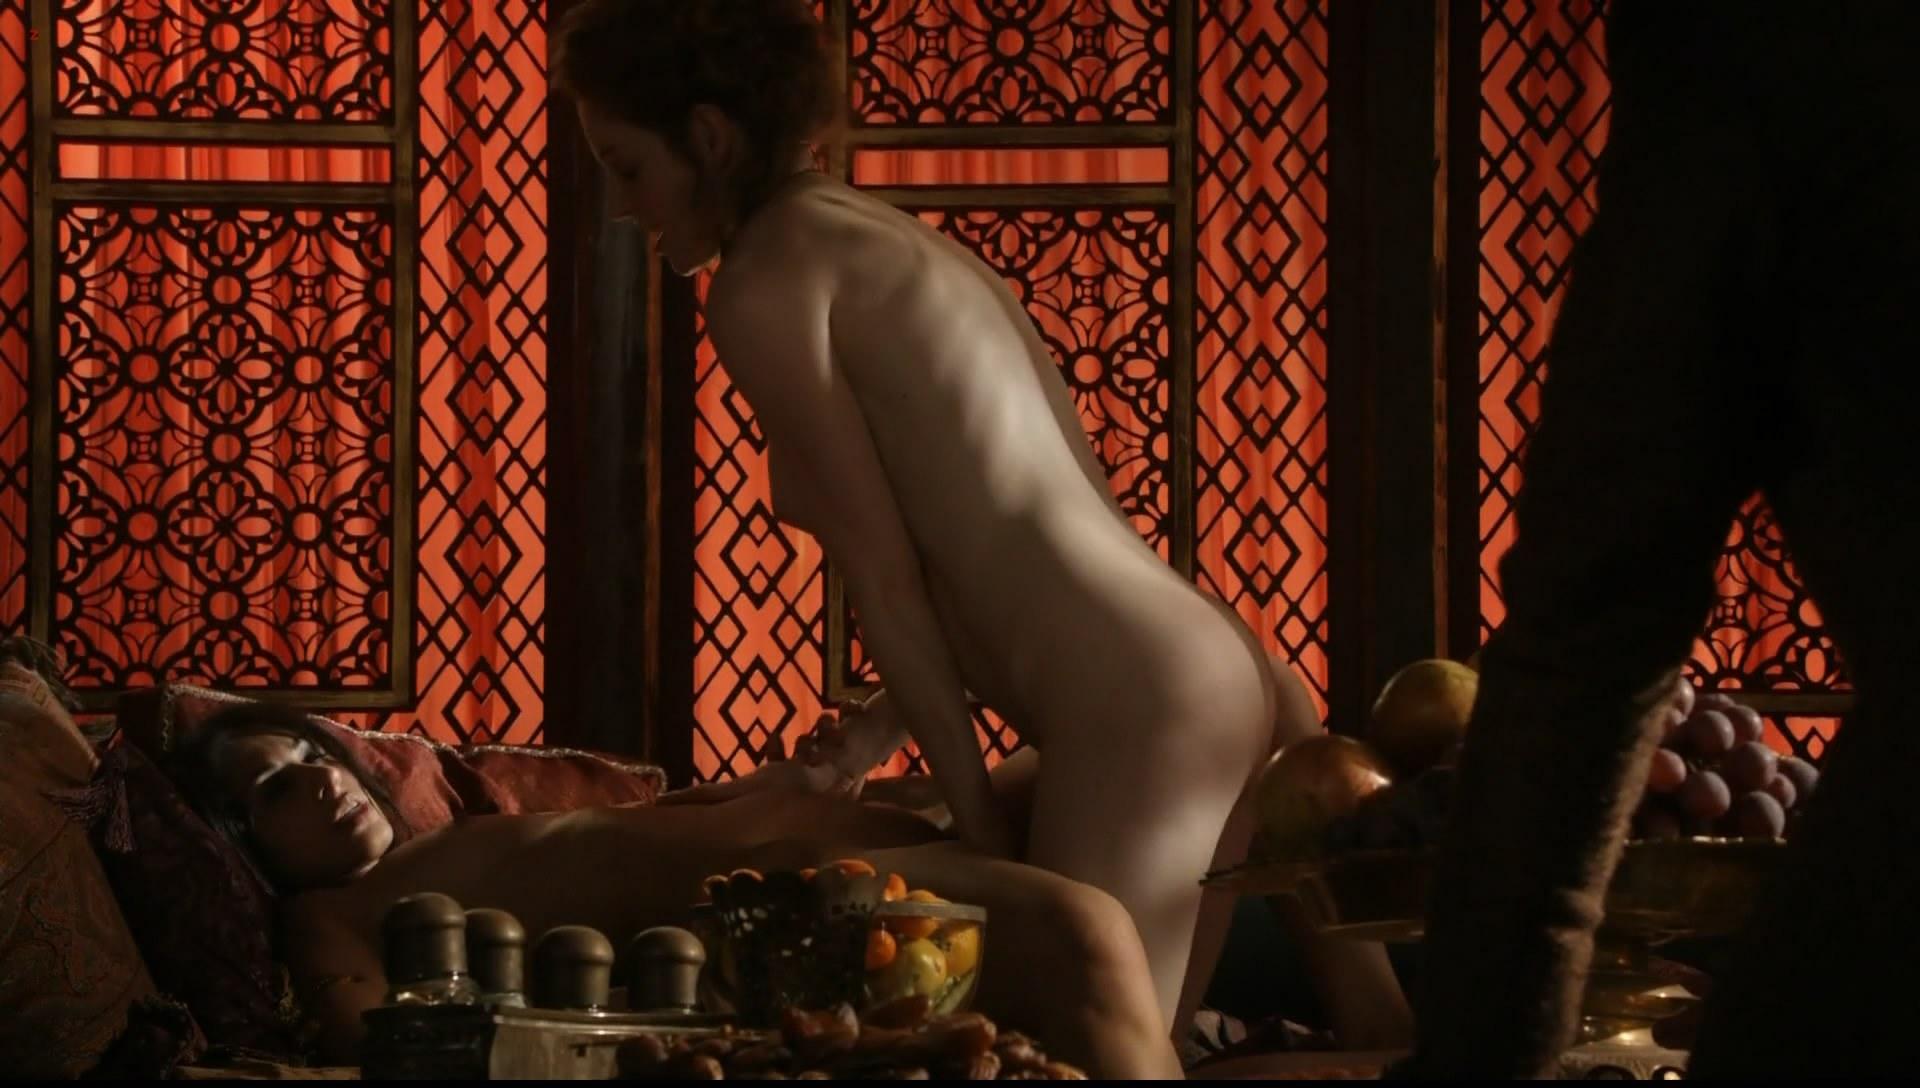 0313180826384_05_Esme-Bianco-nude-topless-Game-of-Thrones-s1e1-hd1080p-41.jpg